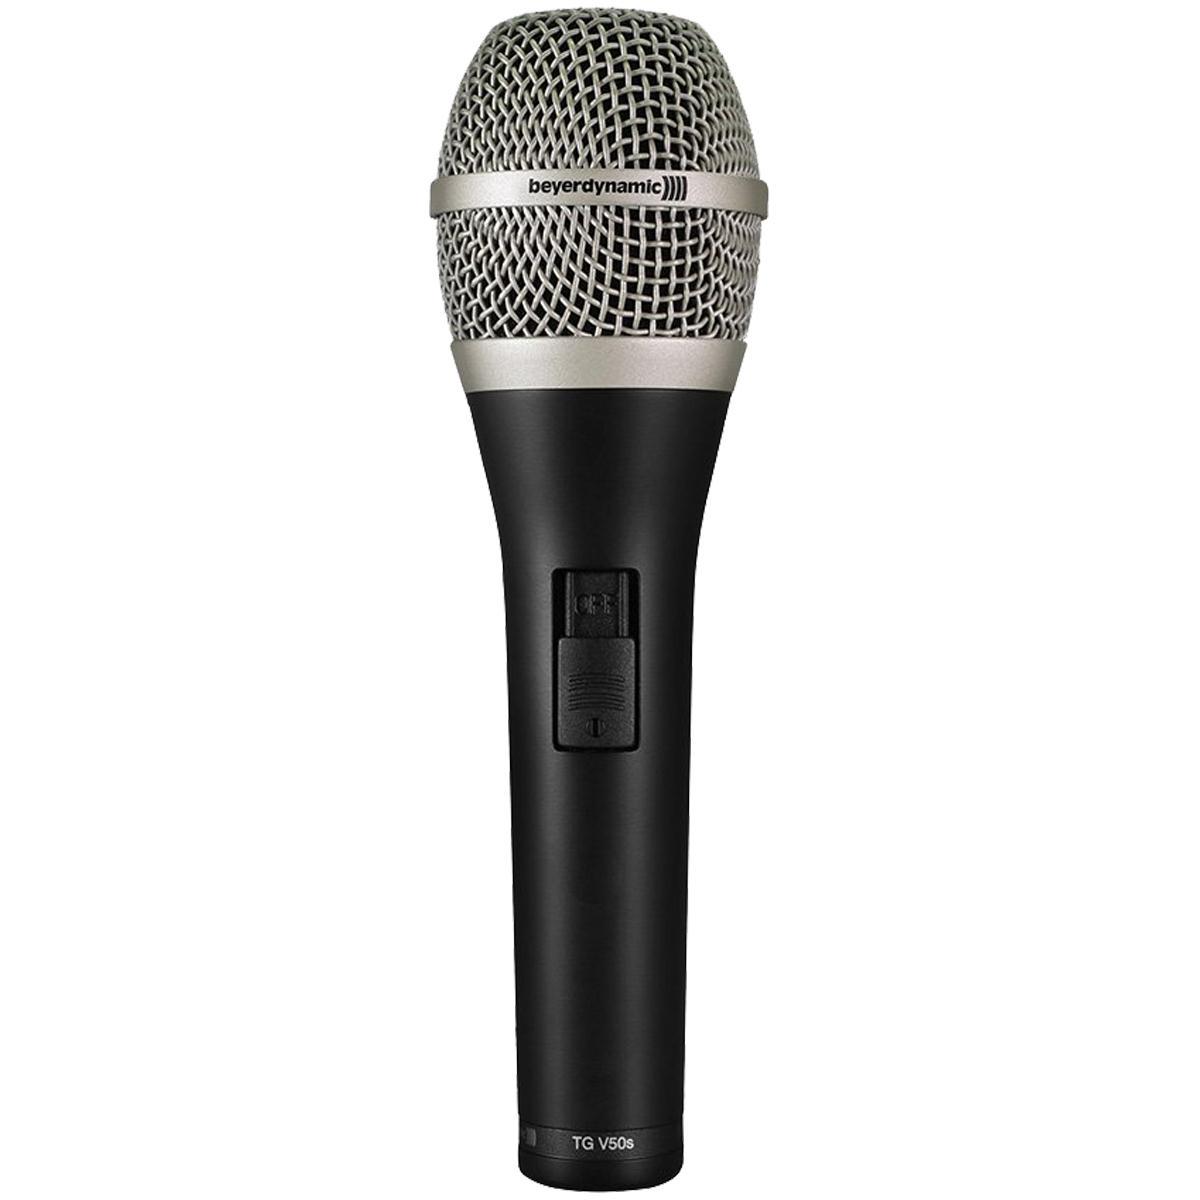 Beyerdynamic Microfone Dinâmico Cardióide TG-V50s